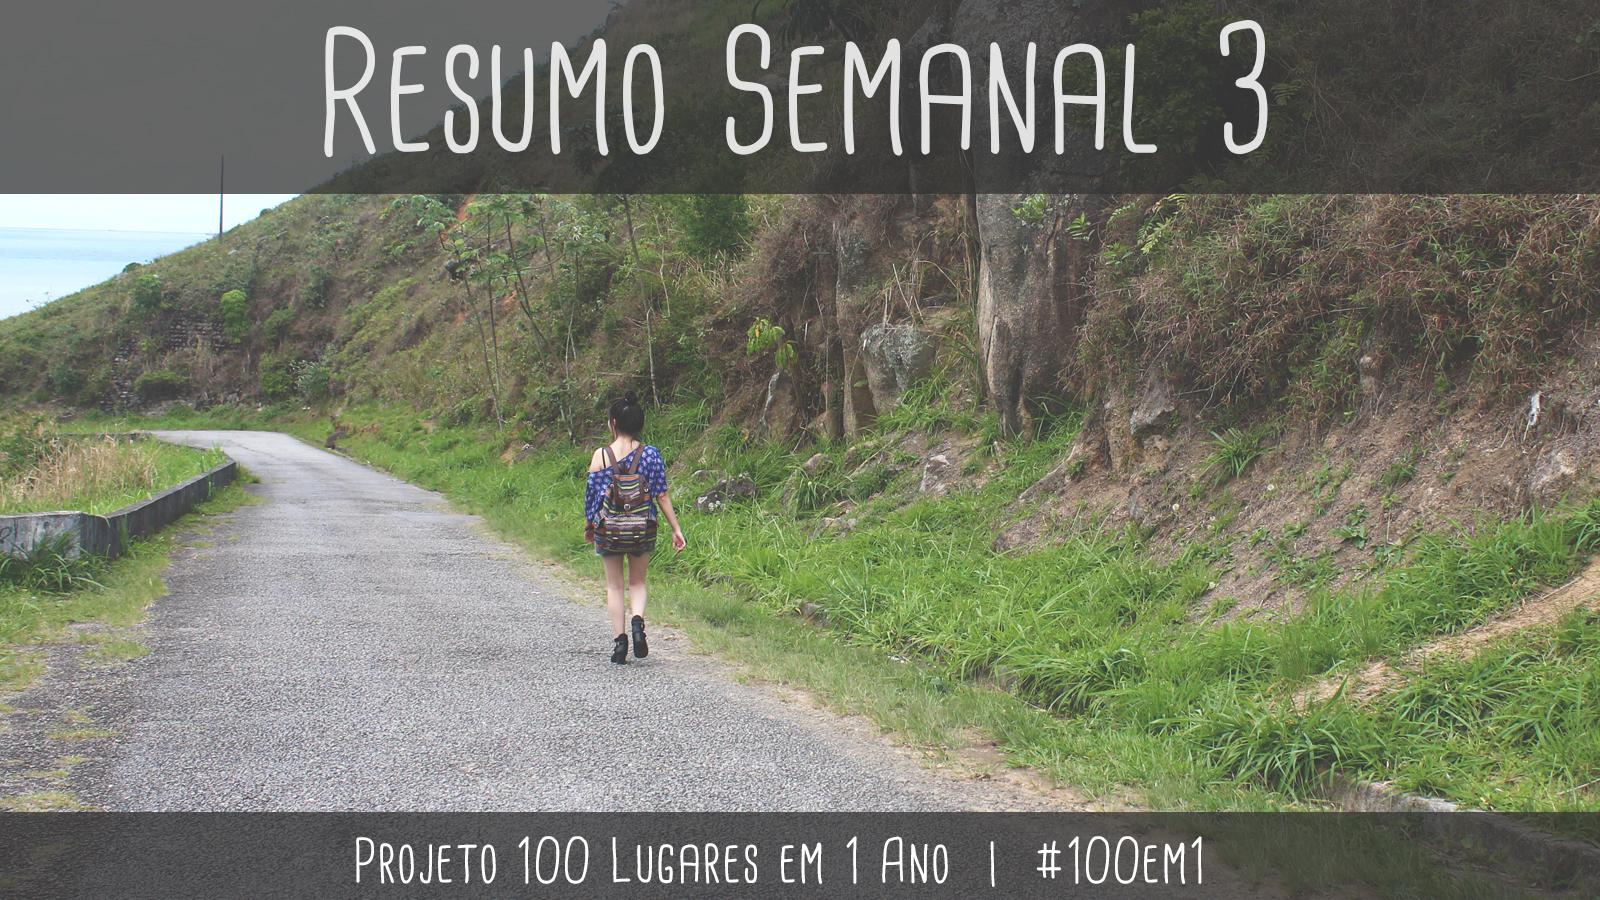 capa projeto #100em1